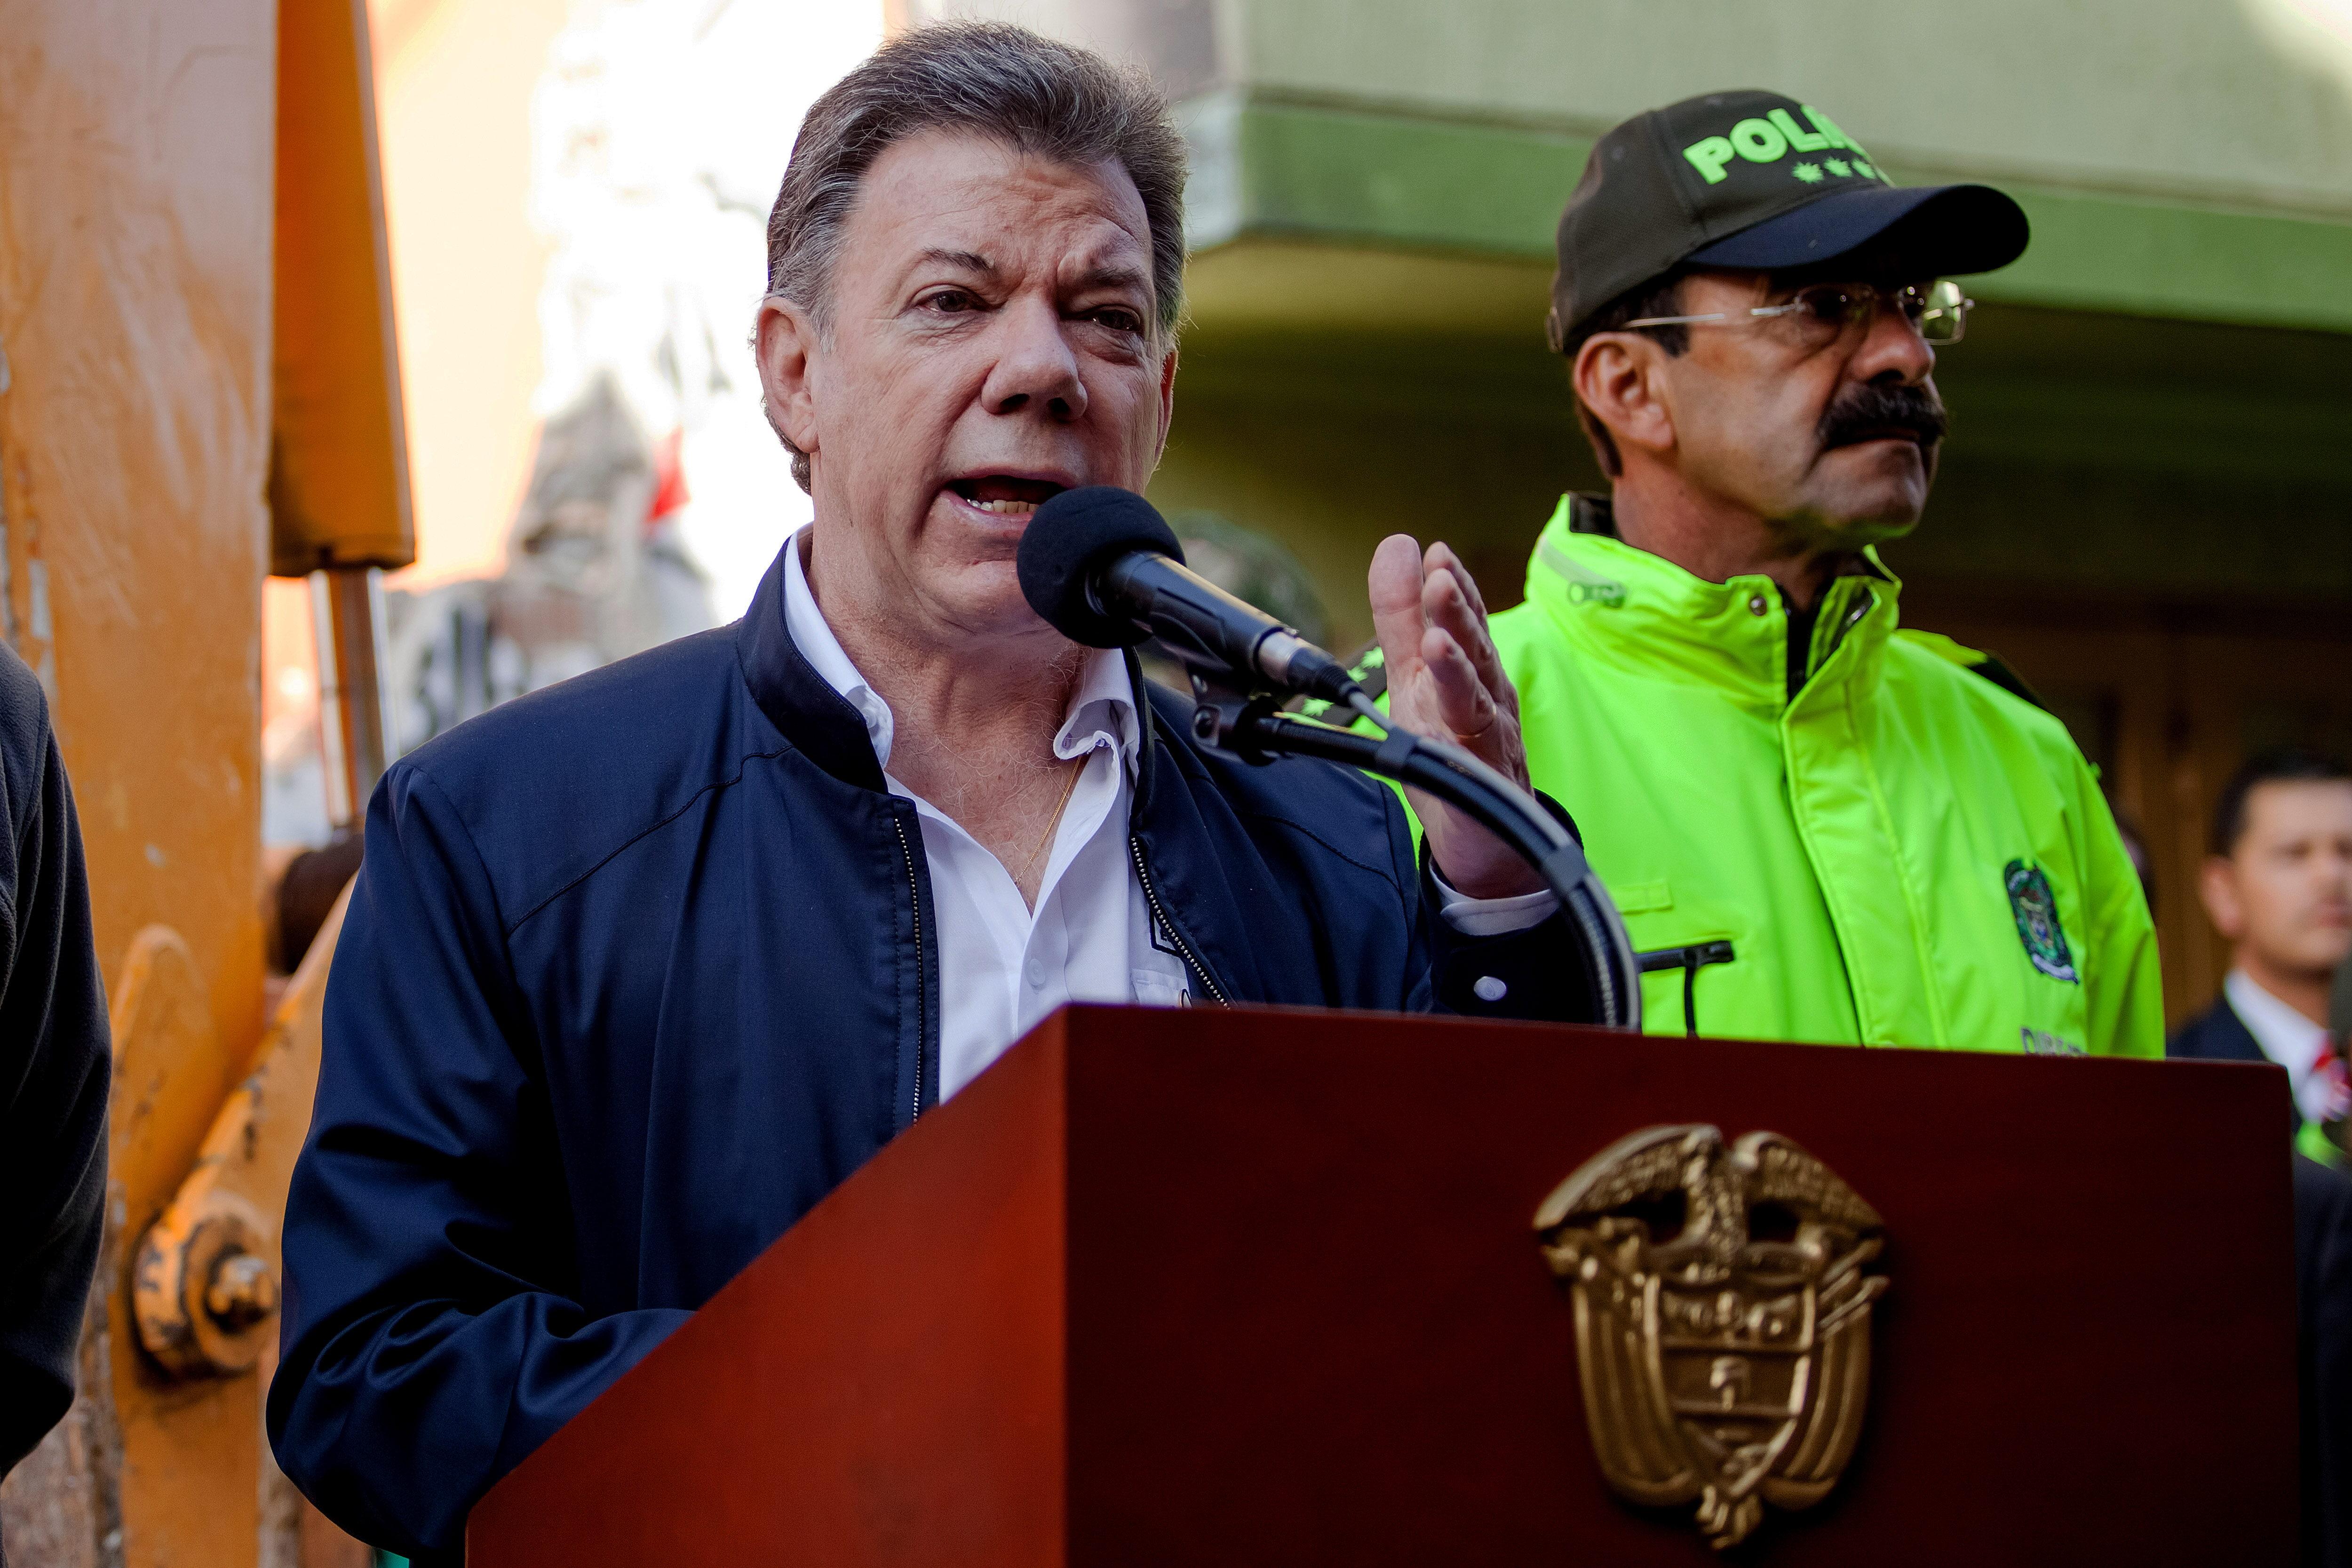 Santos designa a una experta en urbanismo como alcaldesa encargada de Bogotá